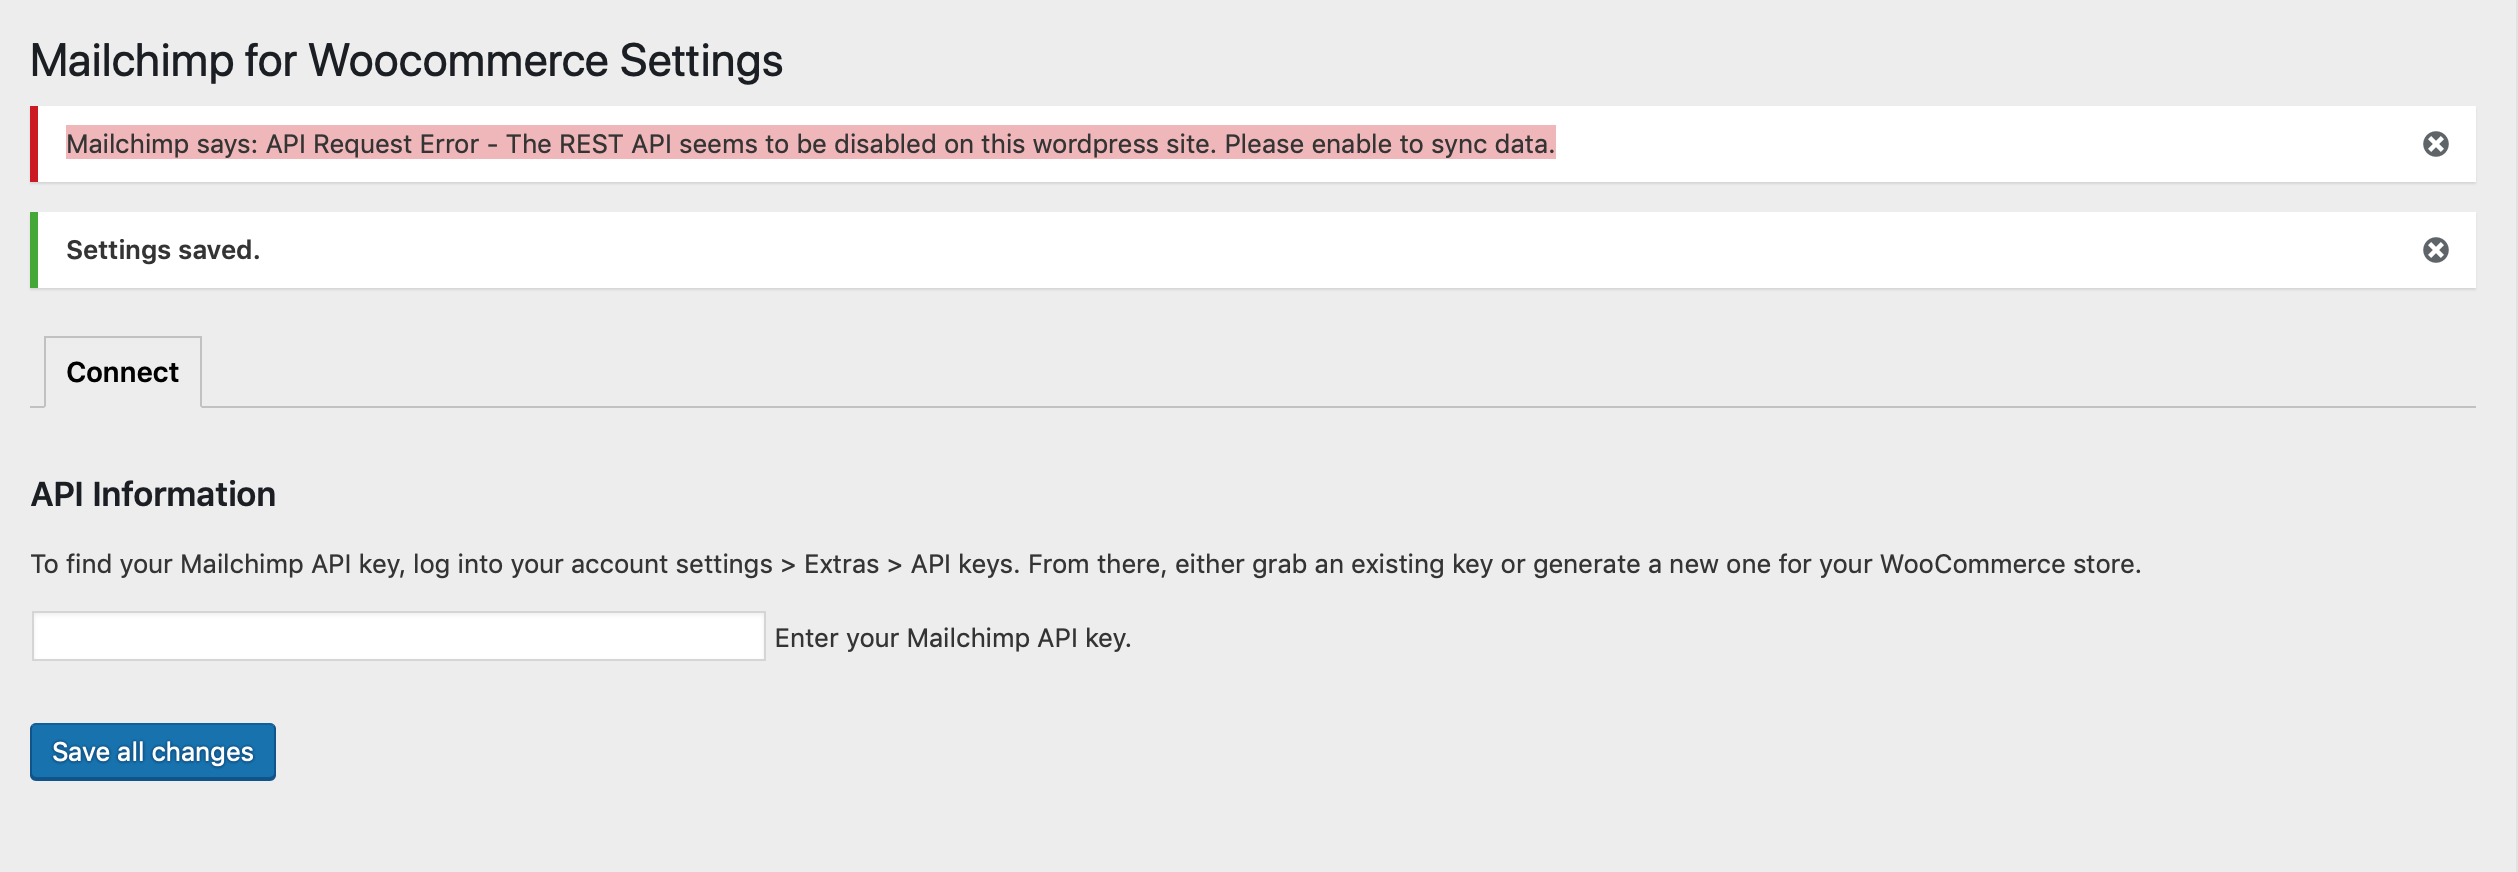 Mailchimp says: API Request Error - The REST API seems to be